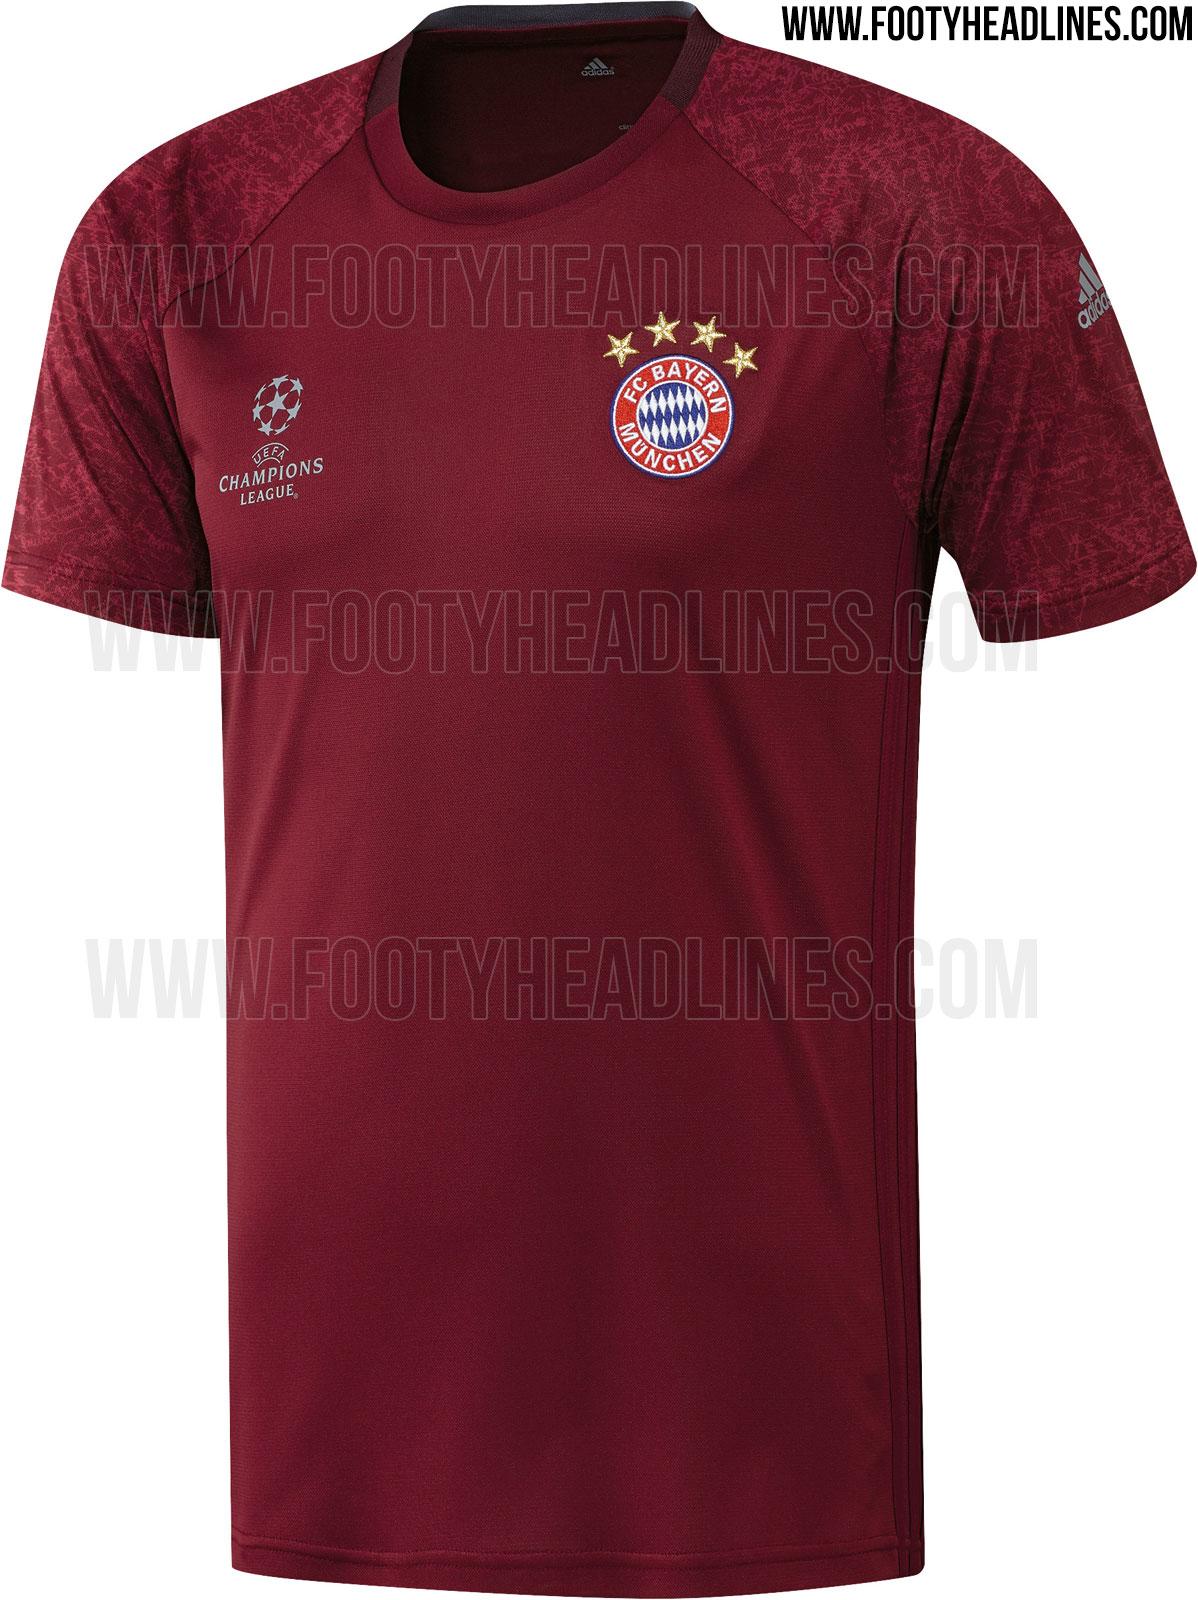 bayern munich 16 17 champions league training shirt leaked. Black Bedroom Furniture Sets. Home Design Ideas